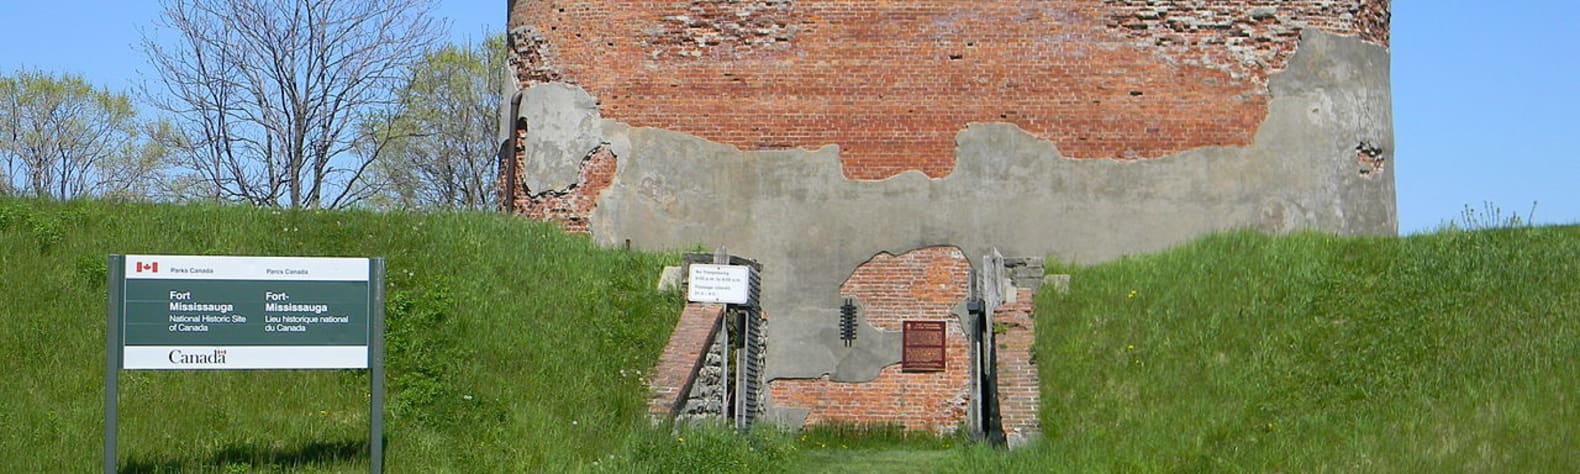 Fort Mississauga National Historic Site